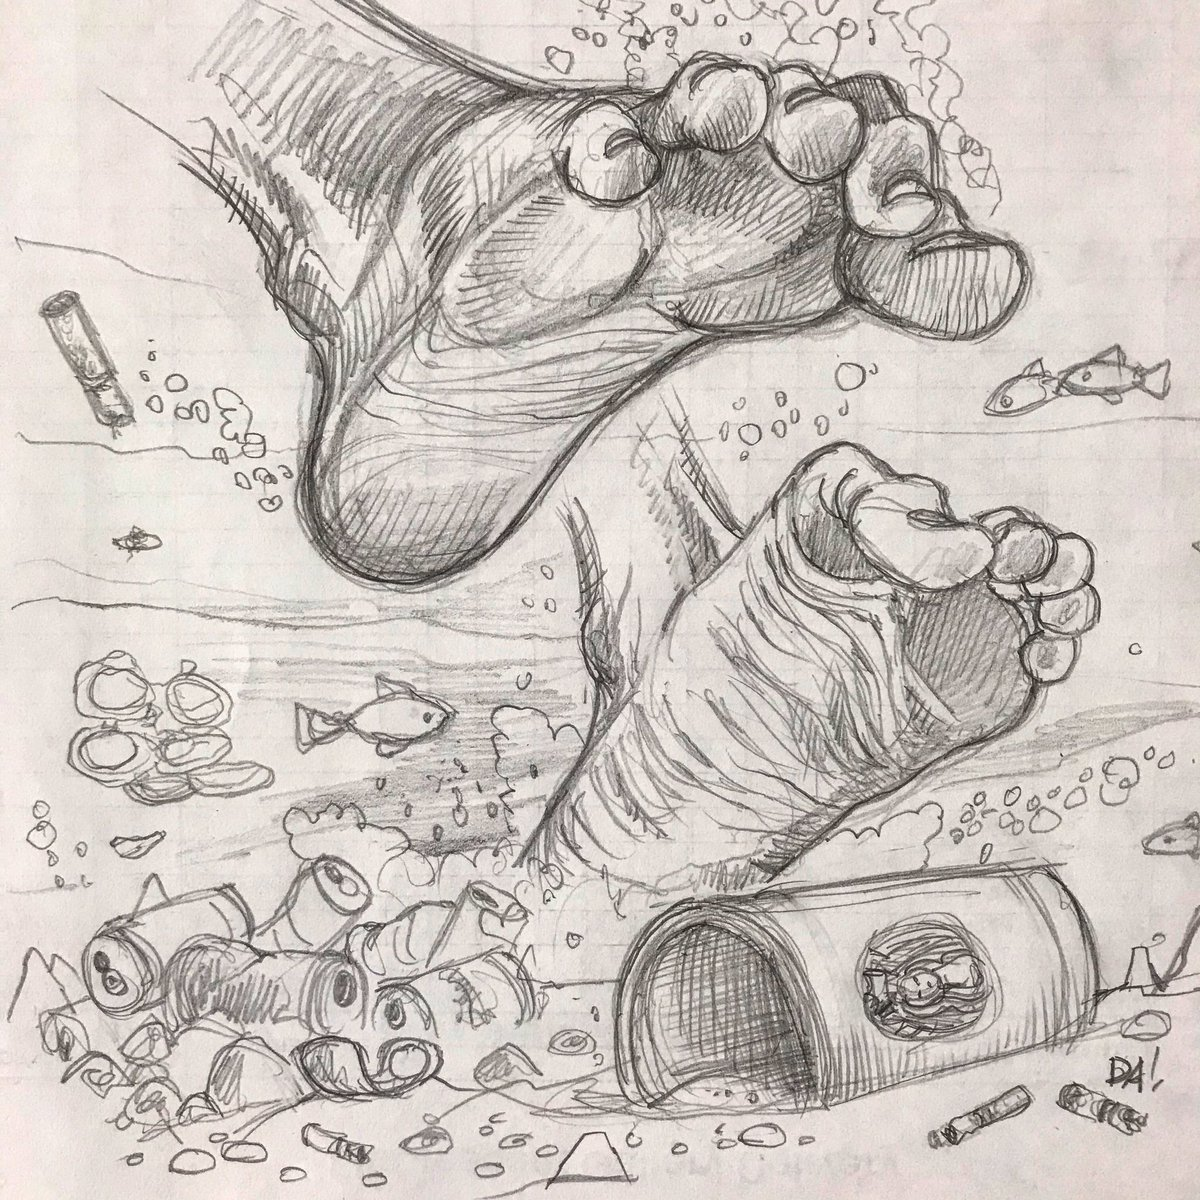 LakeLife. #pickupyourtrash #lakelife #lakelitter #lakewater #recycle #summertime #barefoot #sketch #drawing #Illustrator #conservation #environmentalist #artist #michigan #puremichigan #parabolastar https://t.co/A7np16YxSE